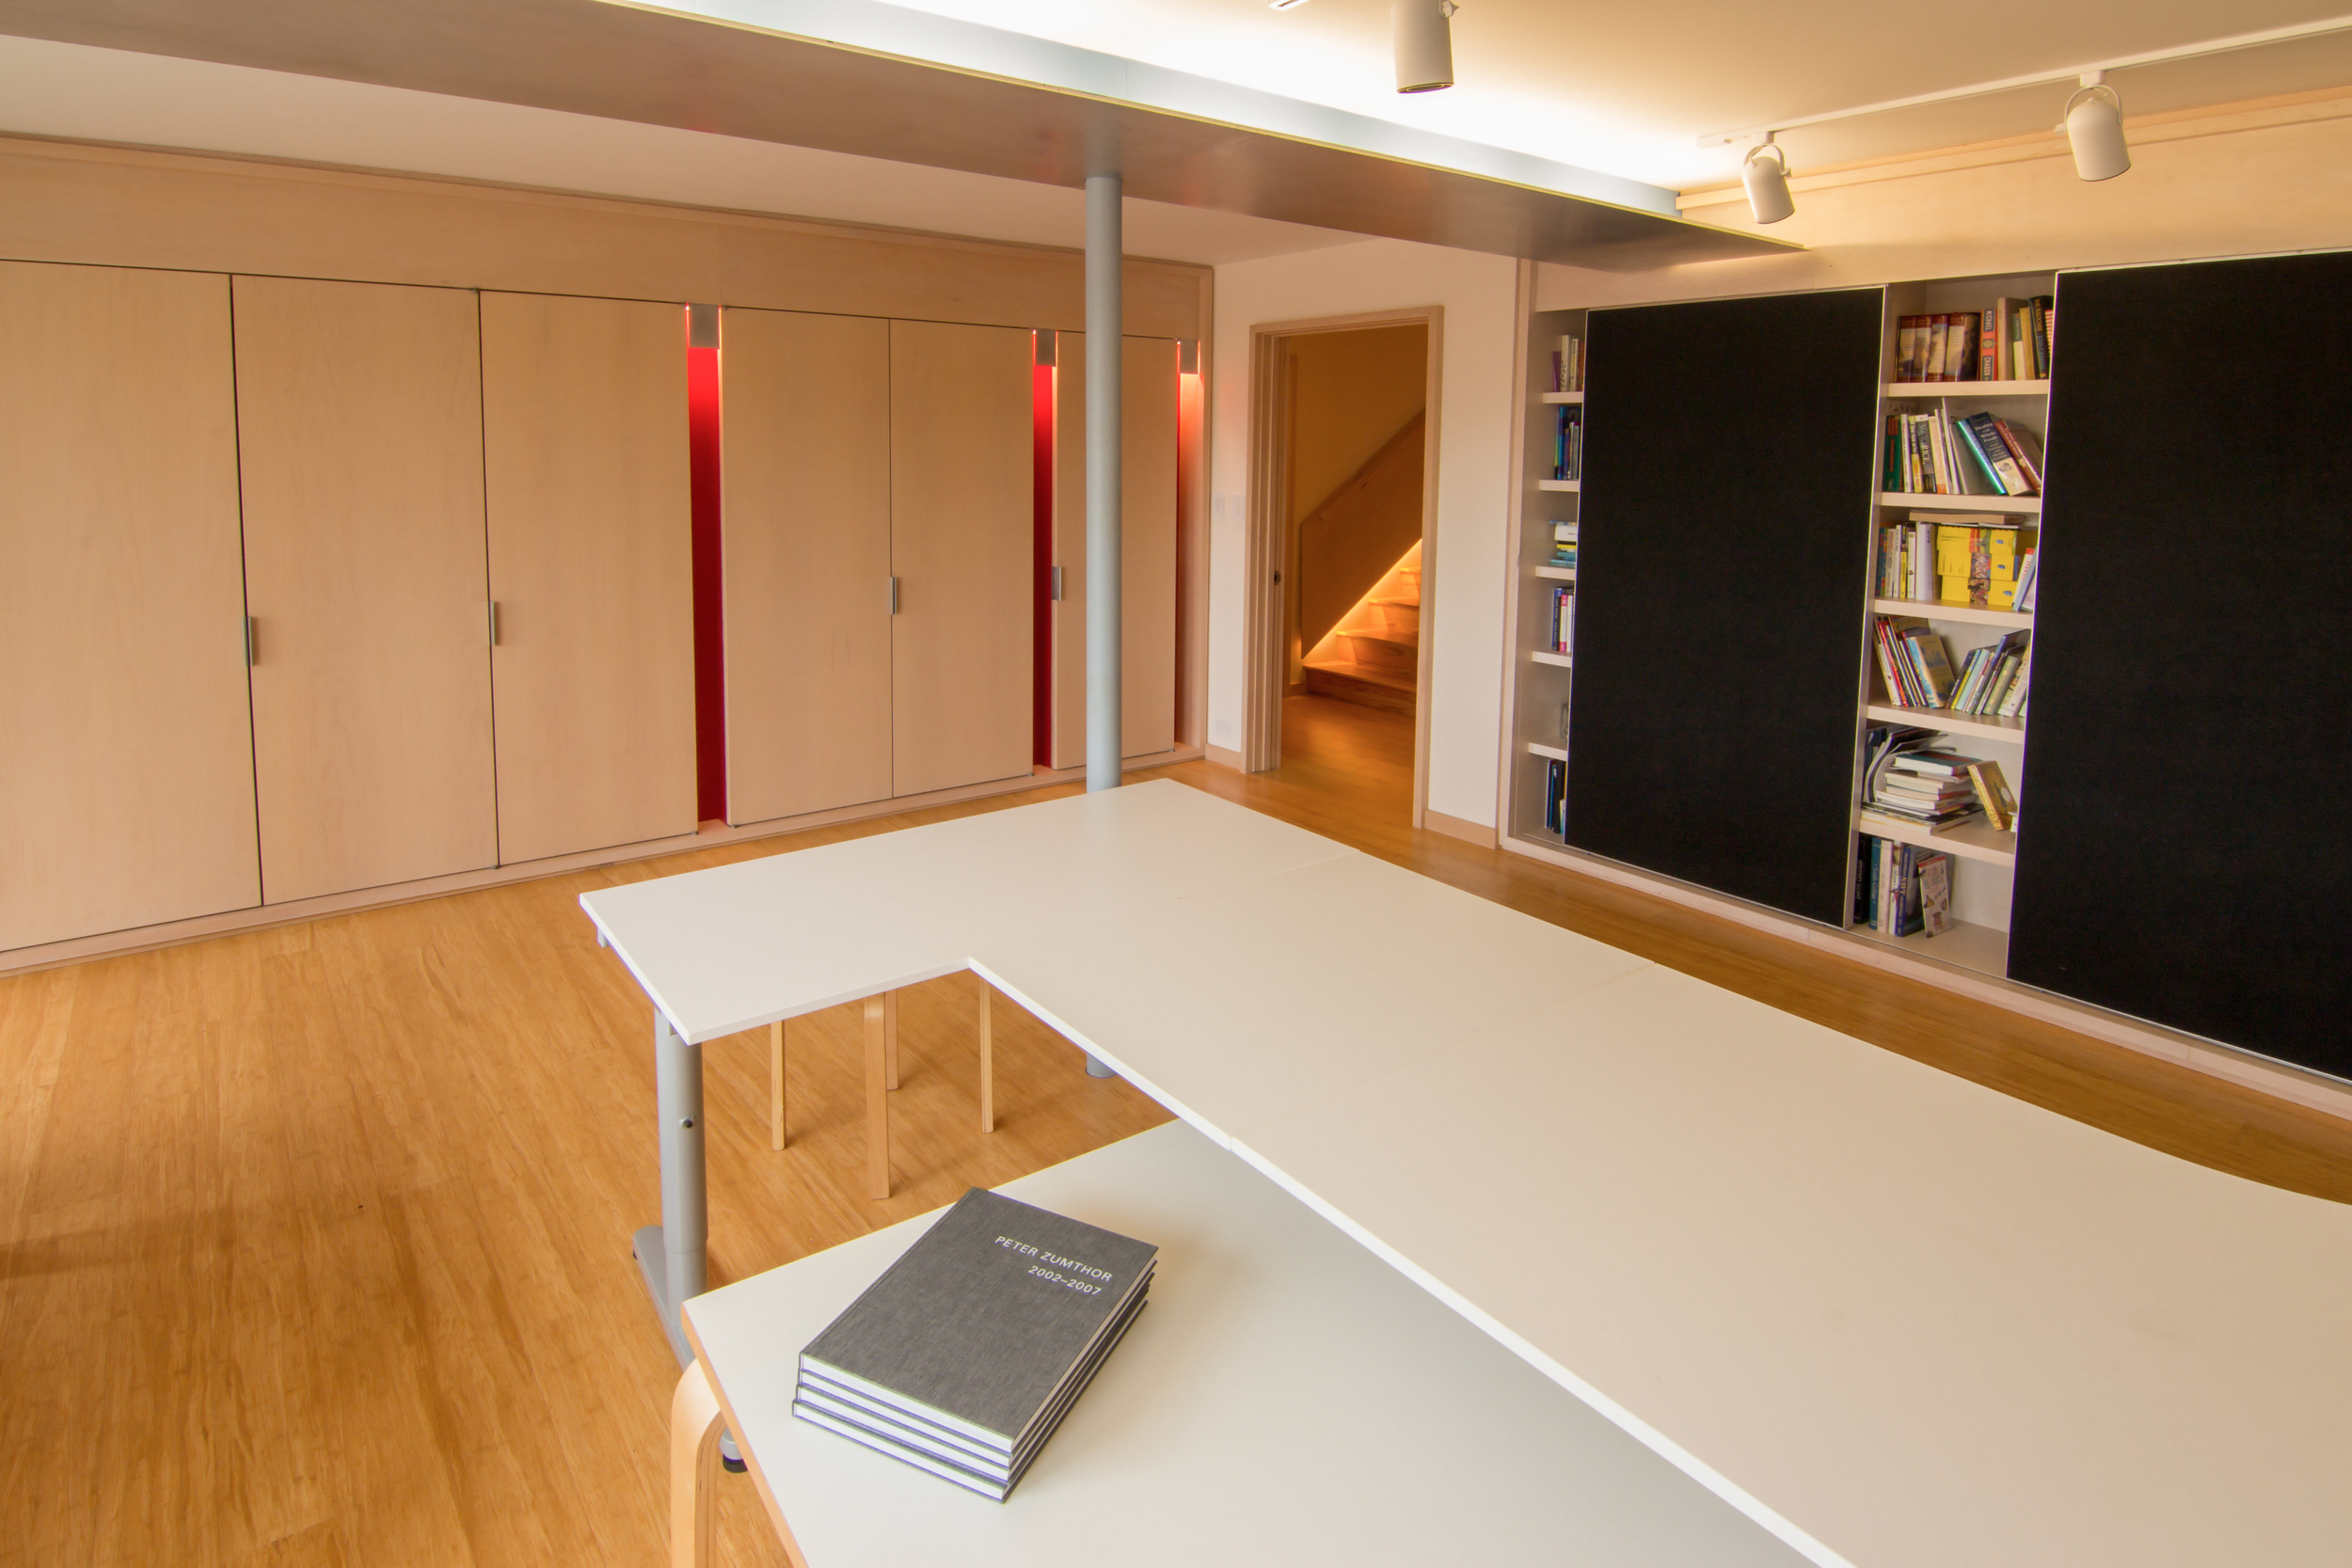 FOAL STUDIO | Liminal Architecture